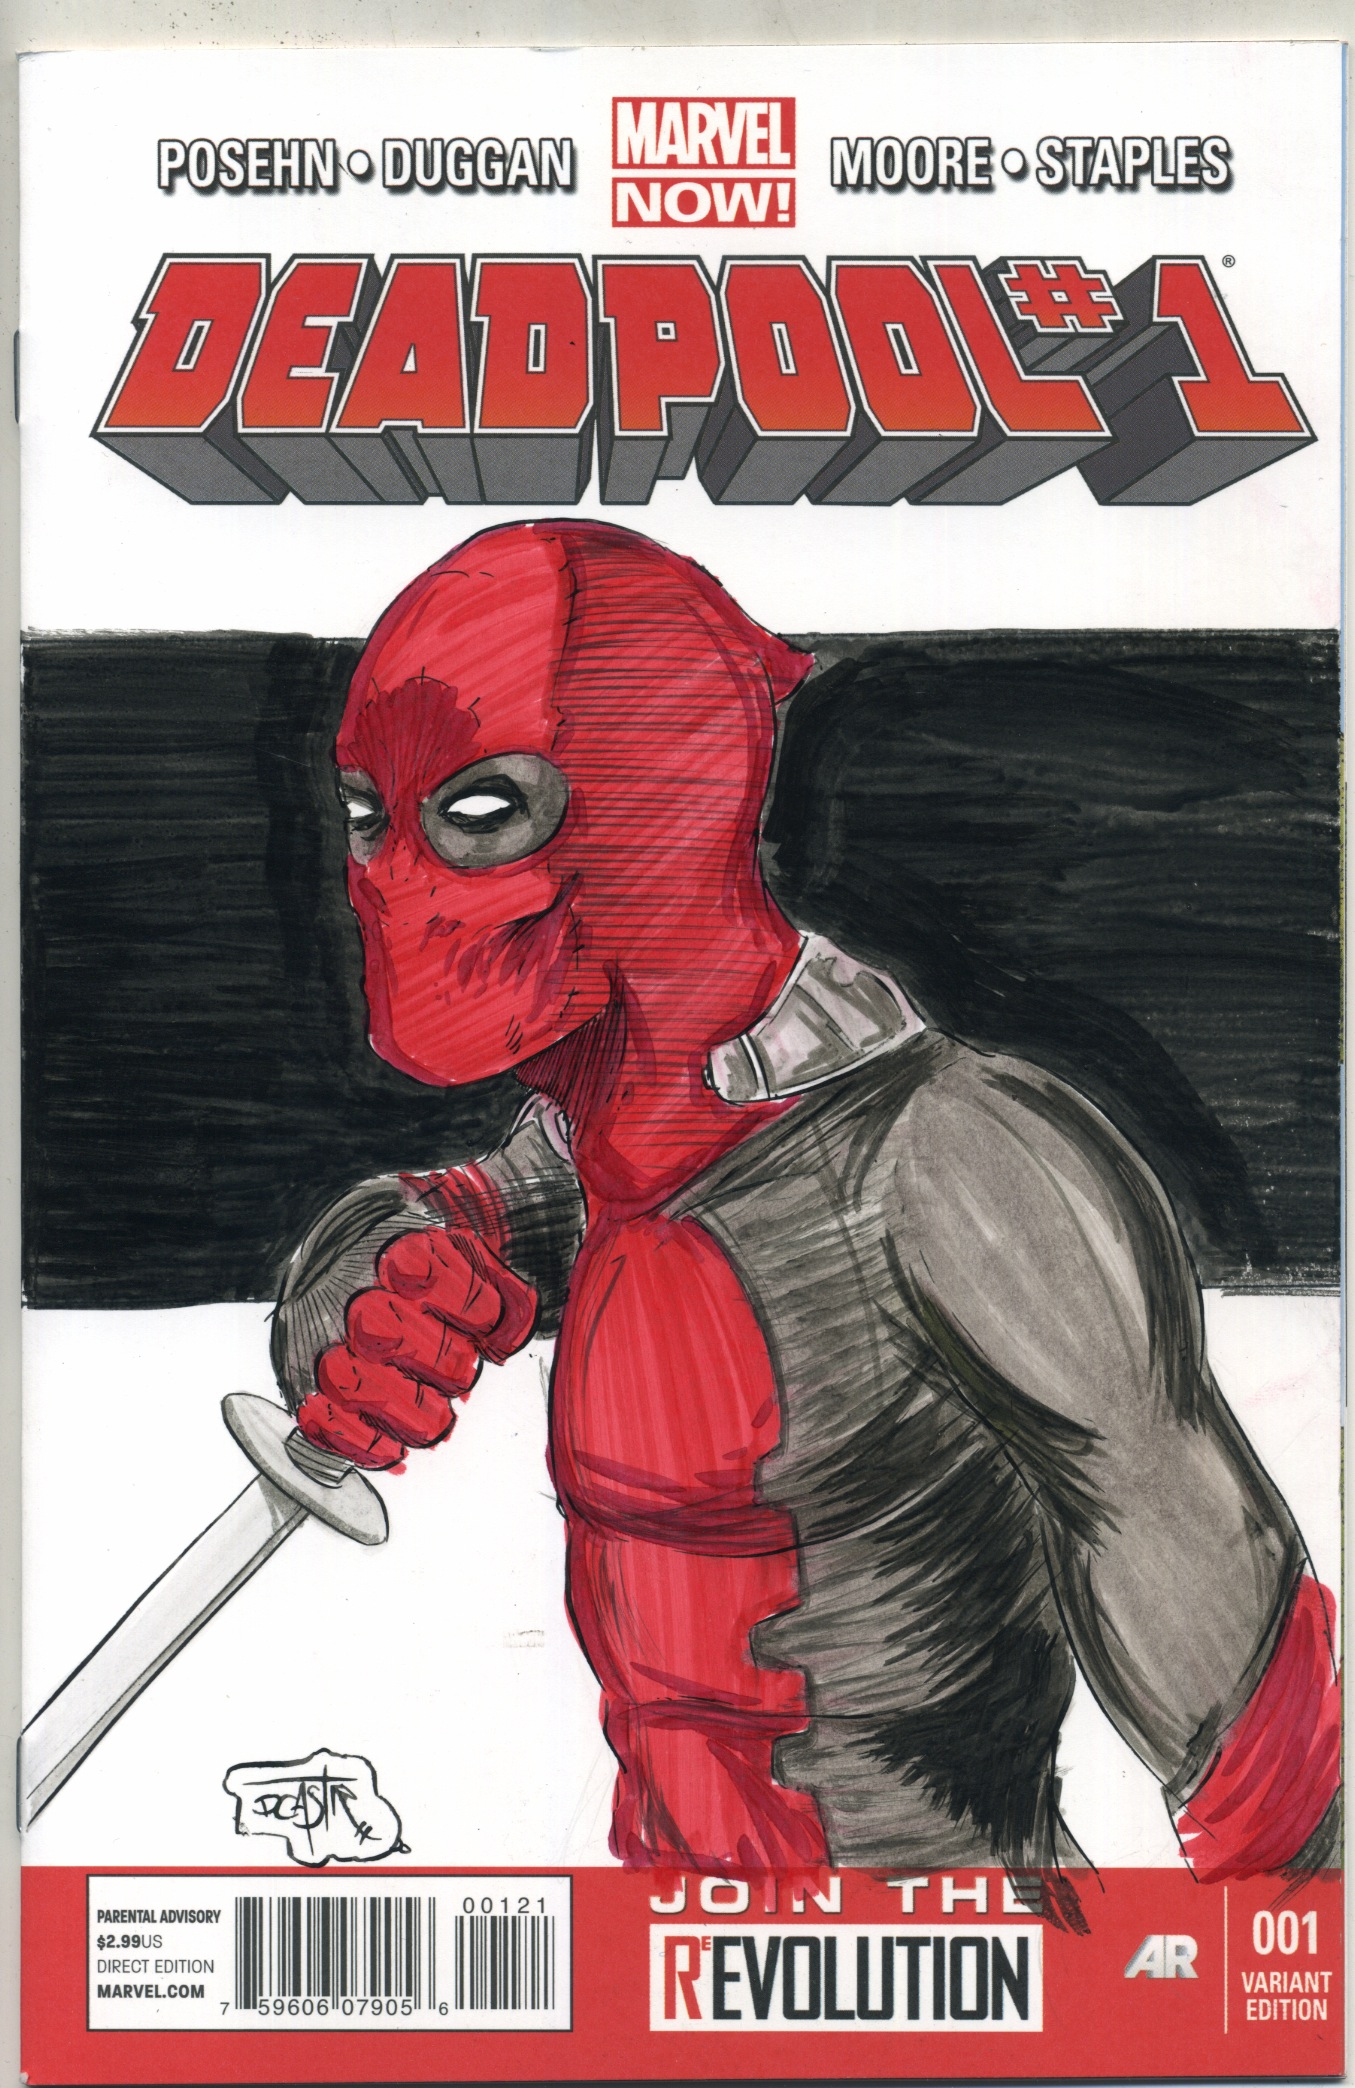 Deadpool #1 sketch cover